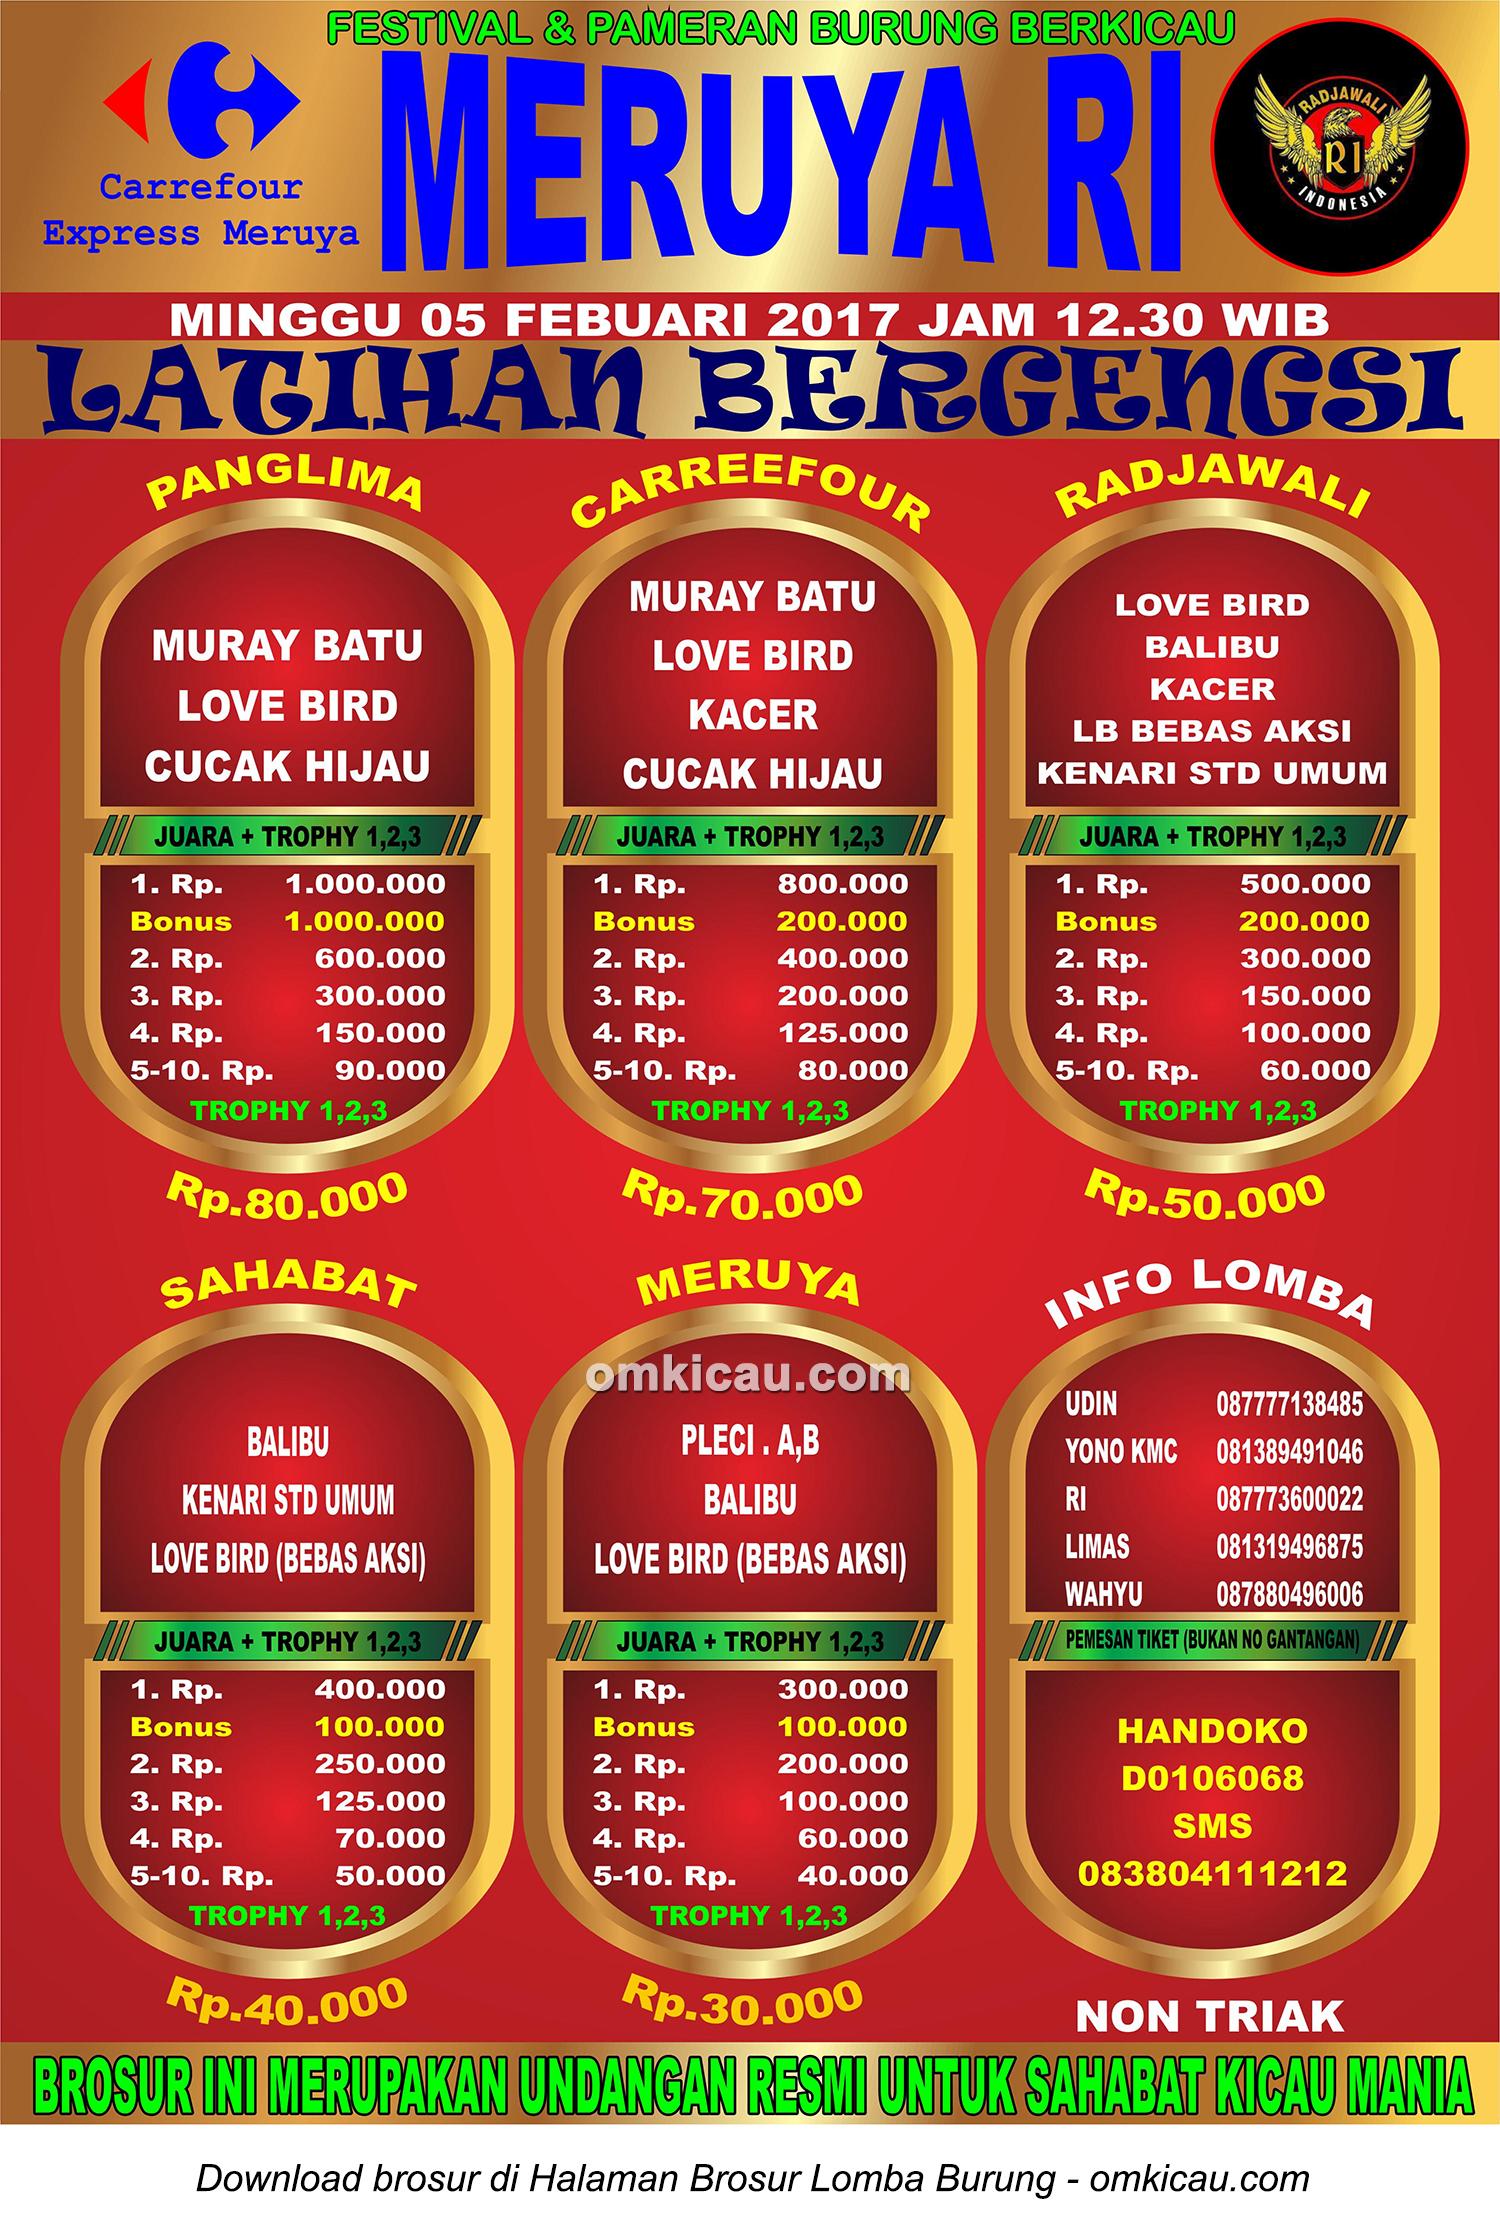 Brosur Latihan Bergengsi Meruya RI, Jakarta Barat, 5 Februari 2017